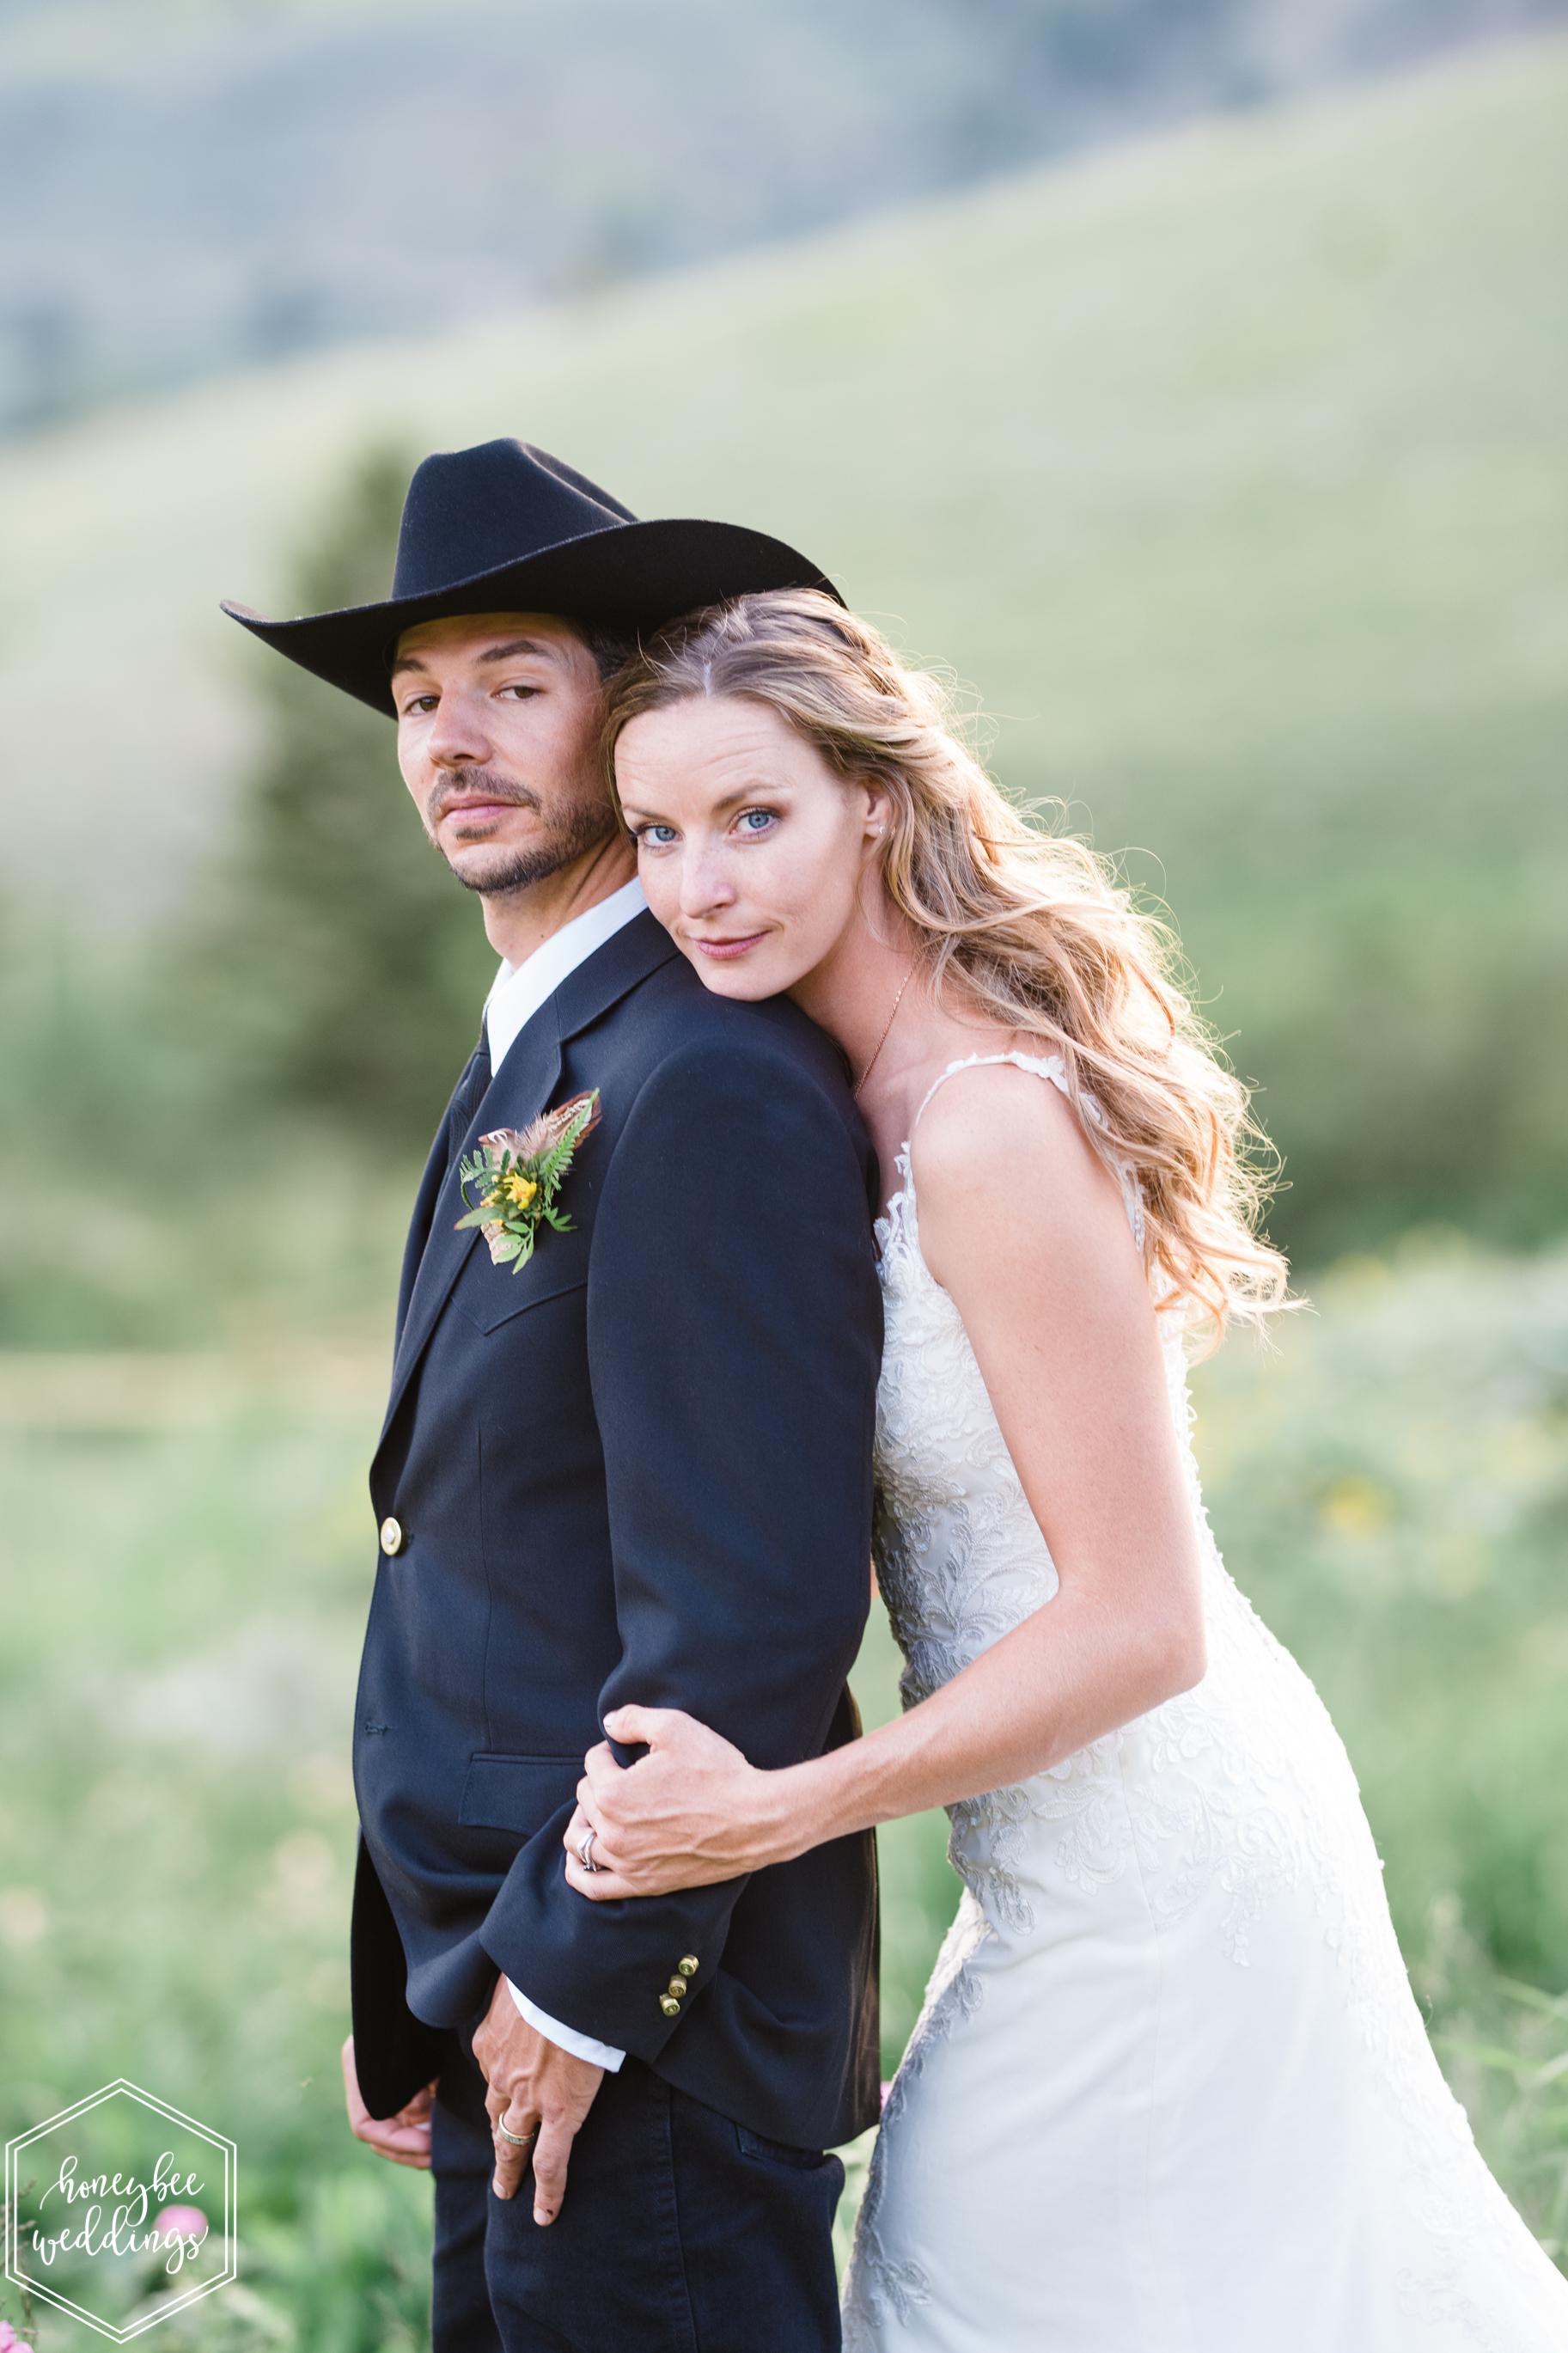 191Yellowstone National Park Wedding_Montana Wedding Photographer_Honeybee Weddings_Shannon & Jonathan_June 29, 2019-2057.jpg